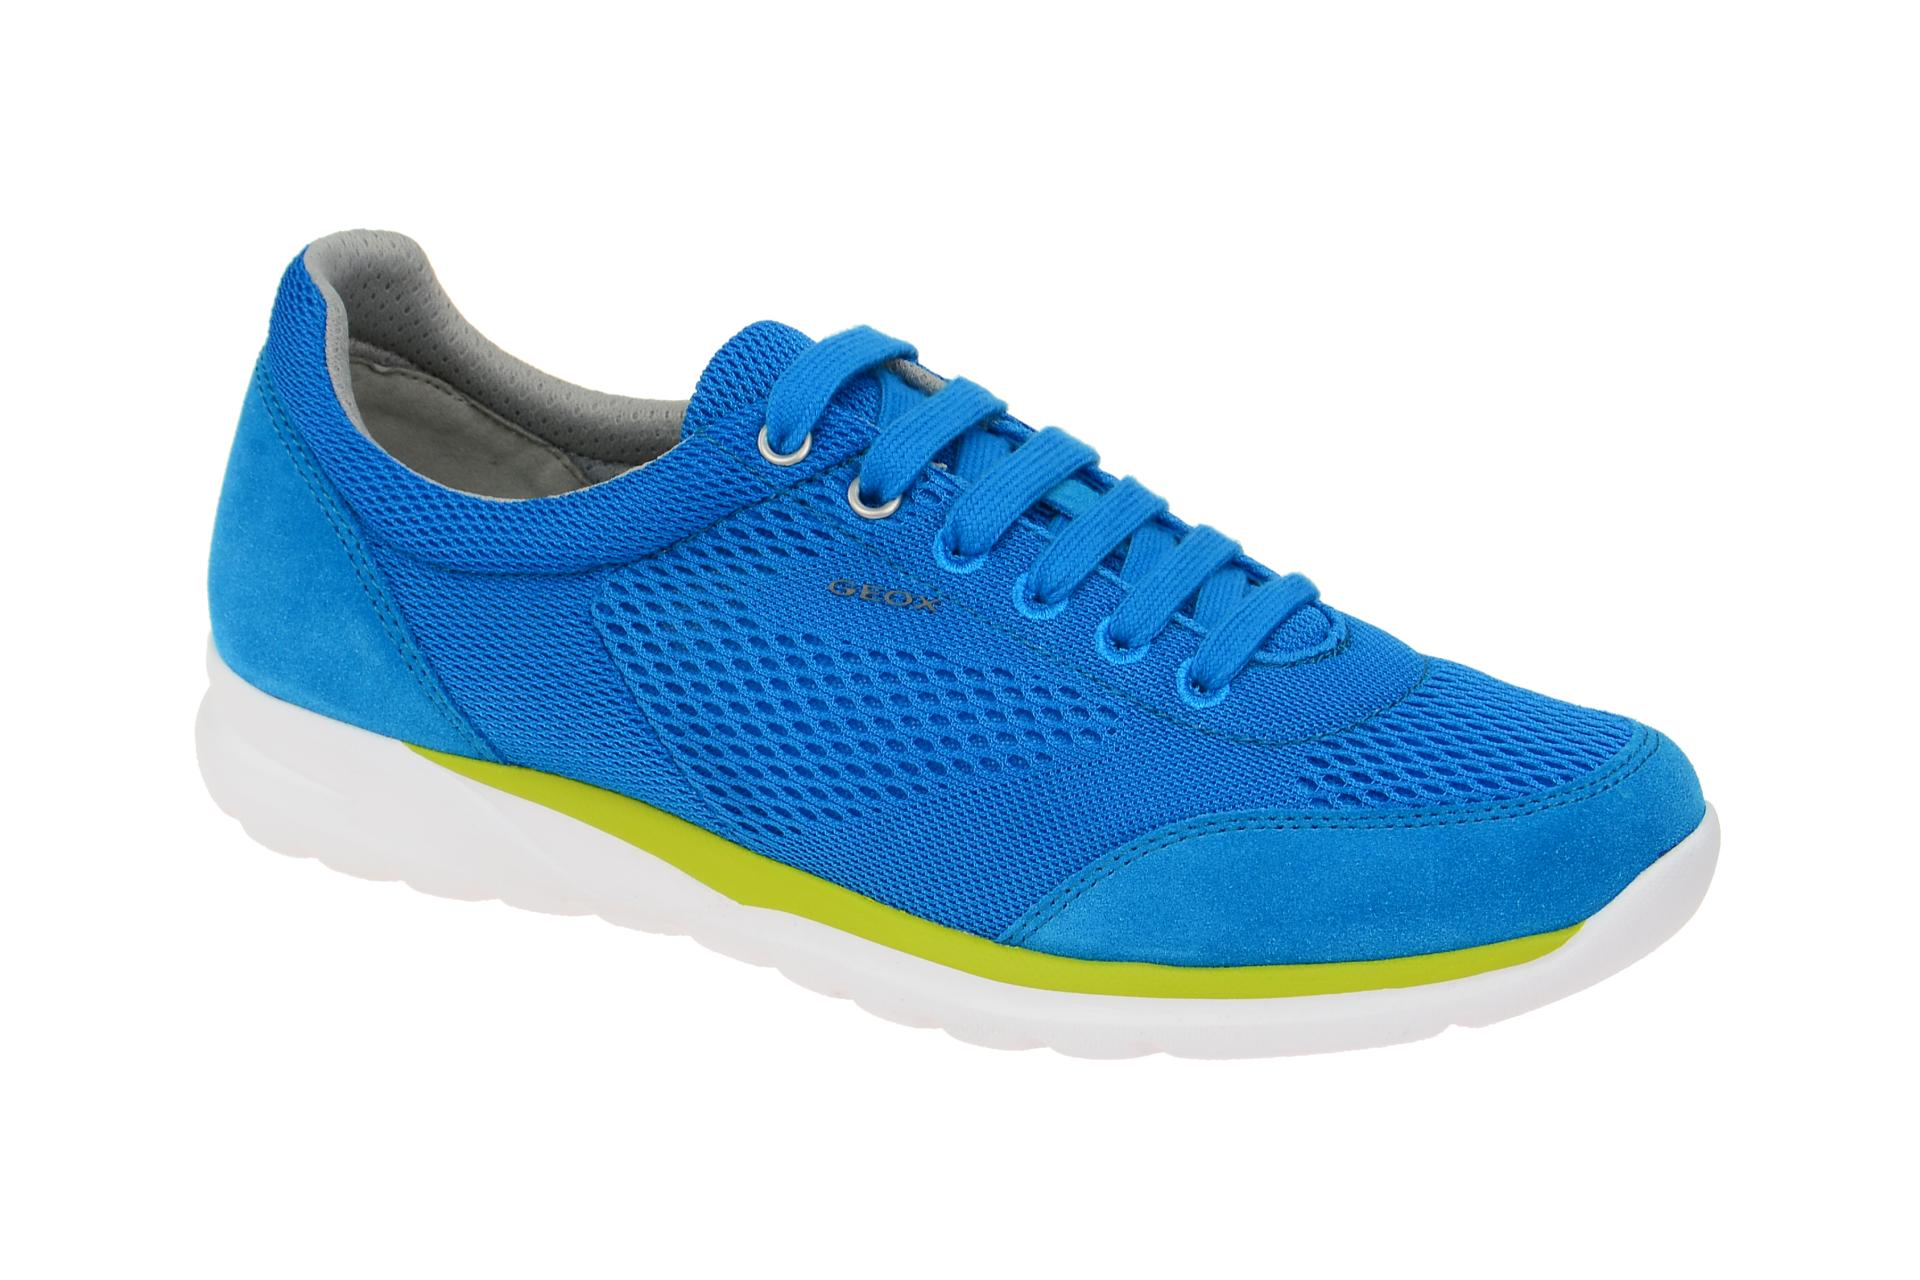 3a325b9d88 Geox Schuhe DAMIAN blau Herrenschuhe sportliche Halbschuhe U720HB 01422  C4004